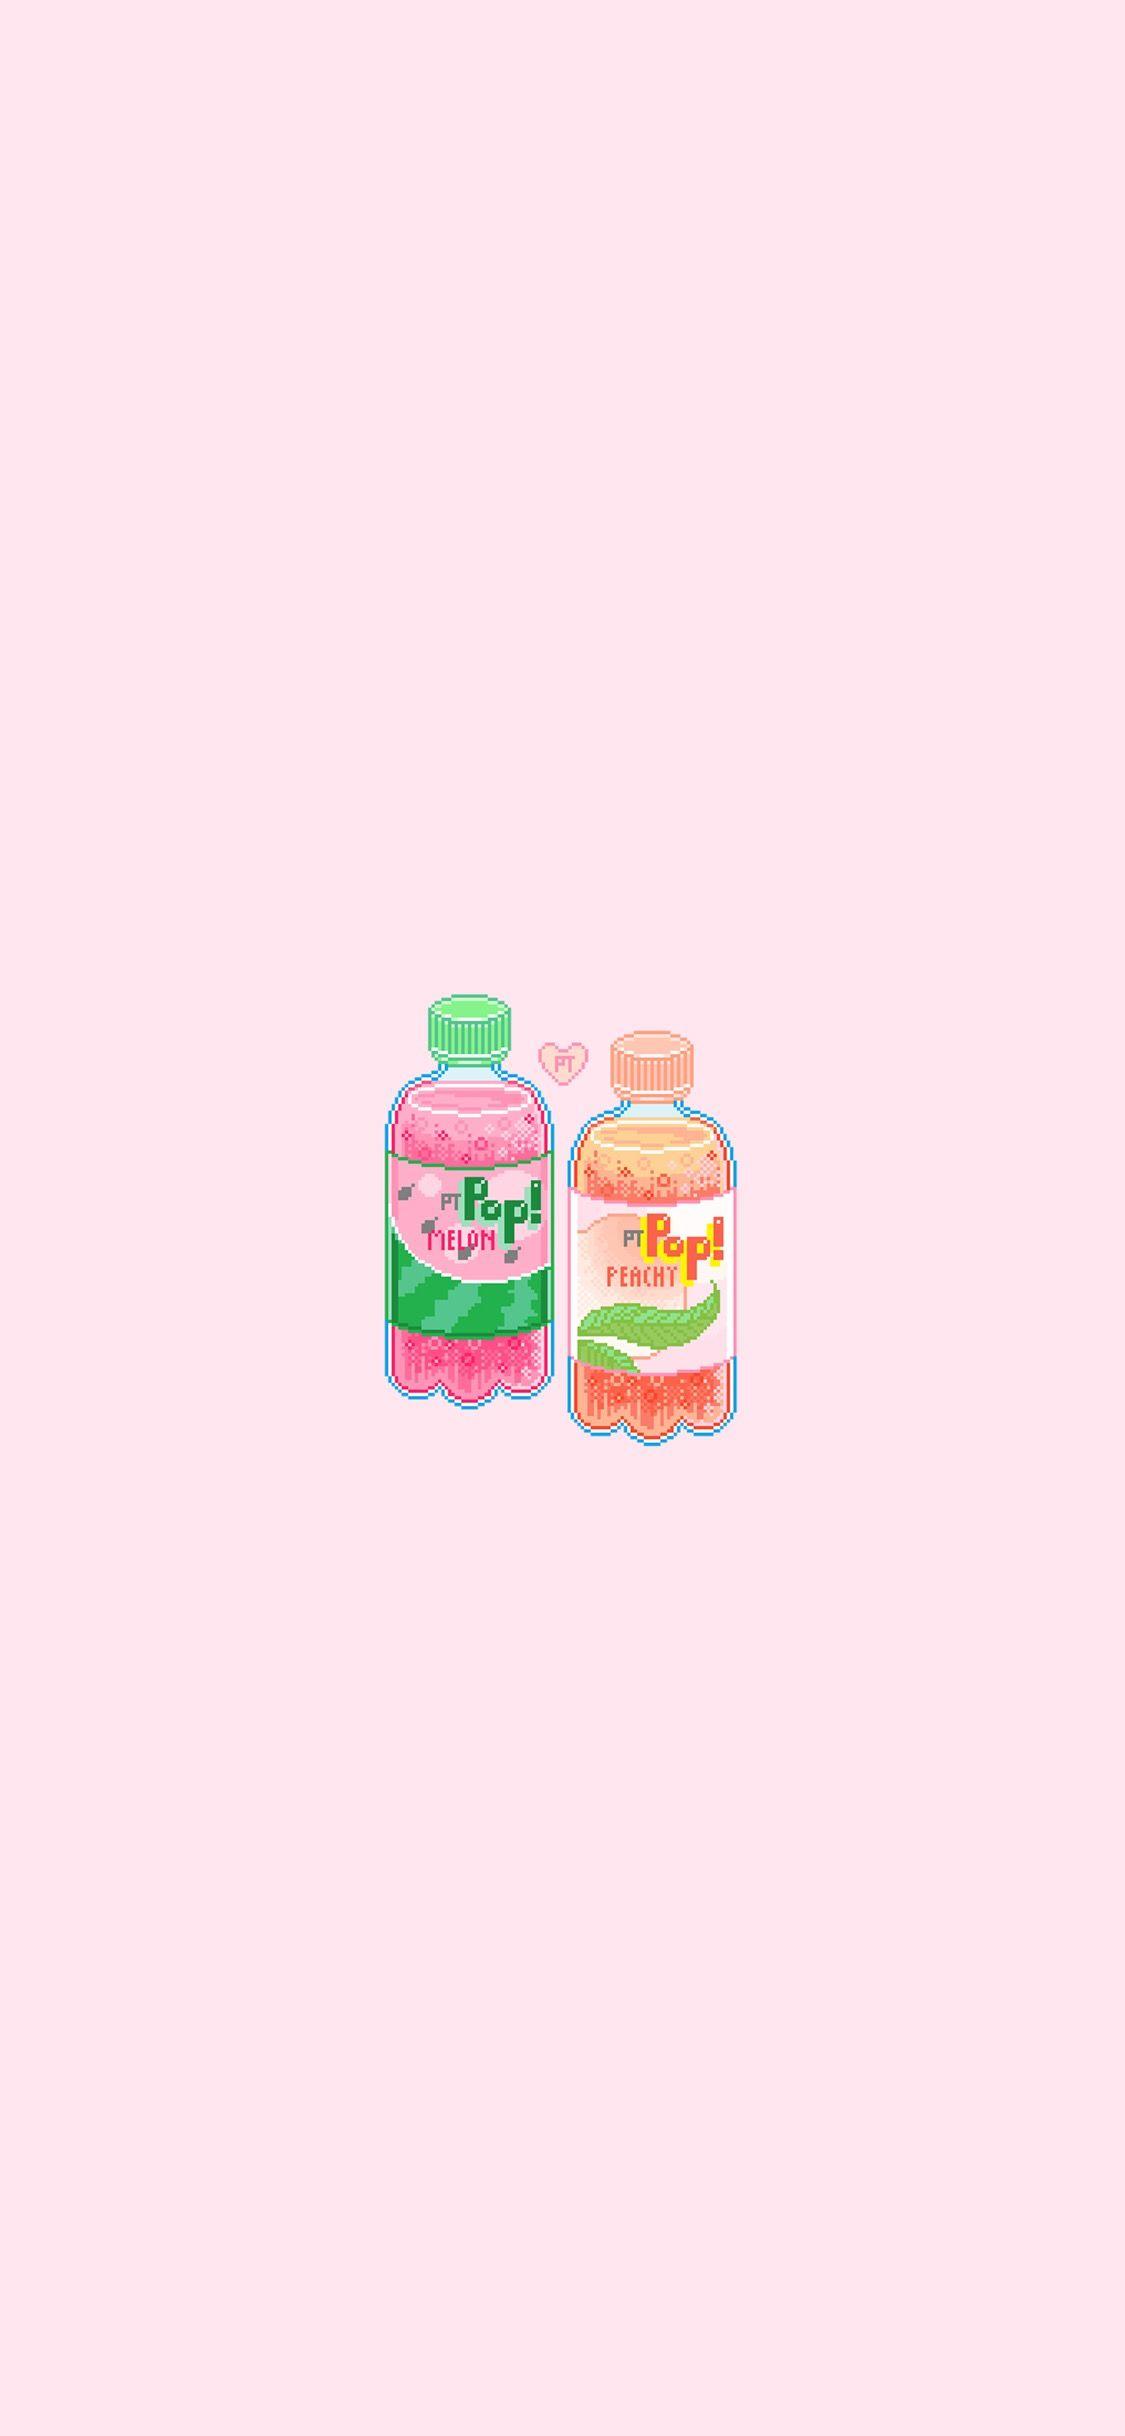 Iphone Pixel Wallpaper Cute Lockscreens Kawaii Wallpaper Iphone Wallpaper